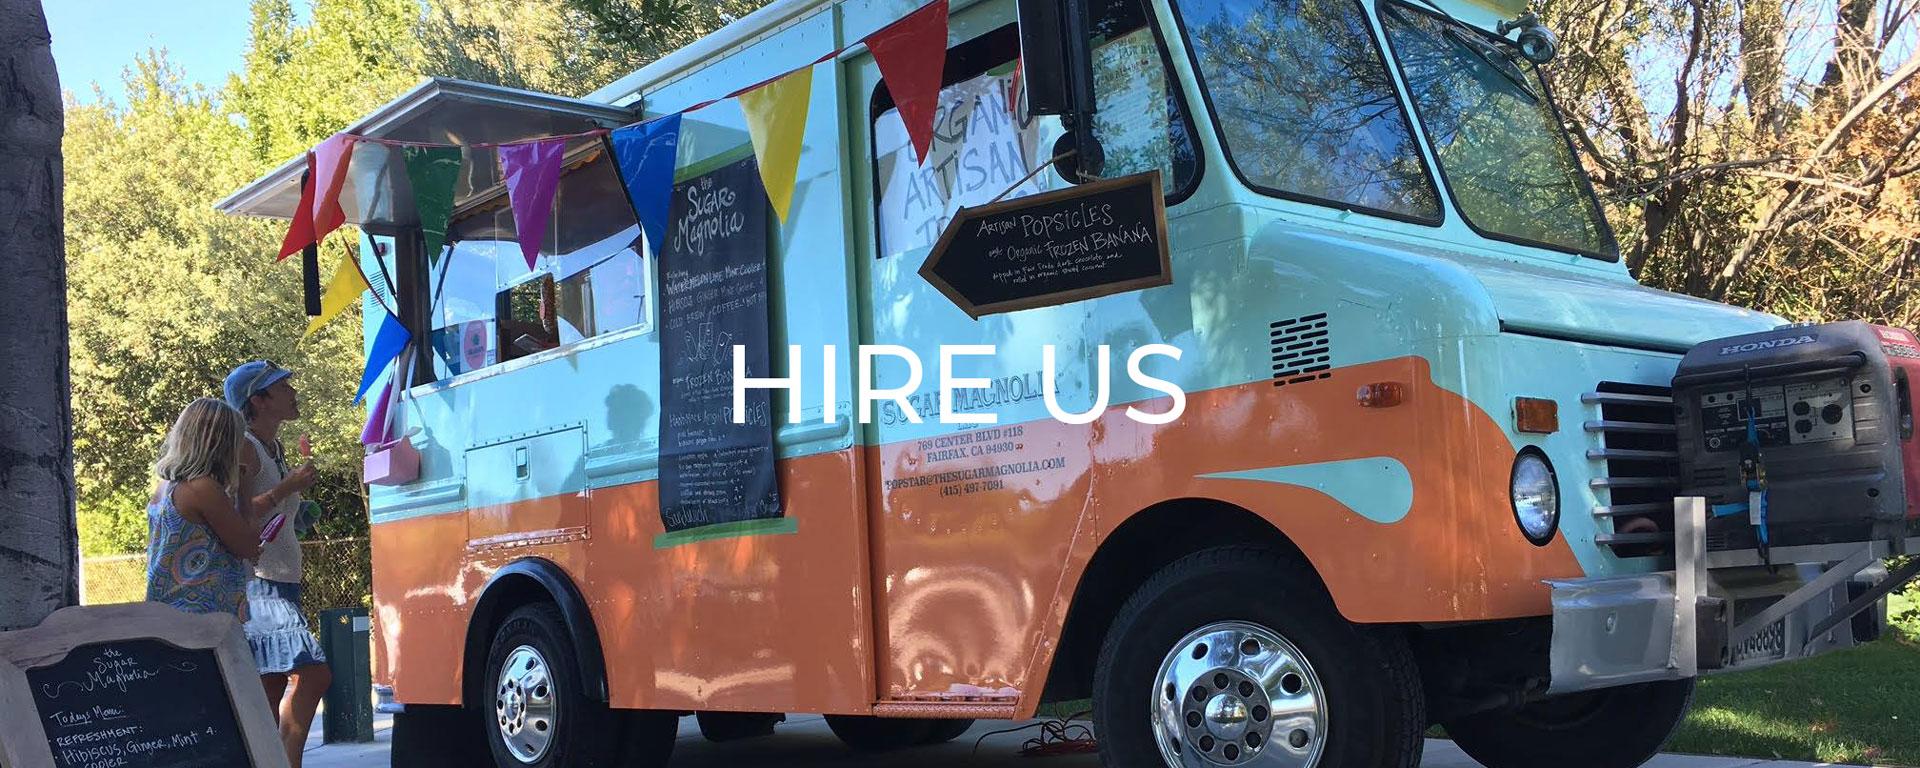 hire-us-banner-1.jpg